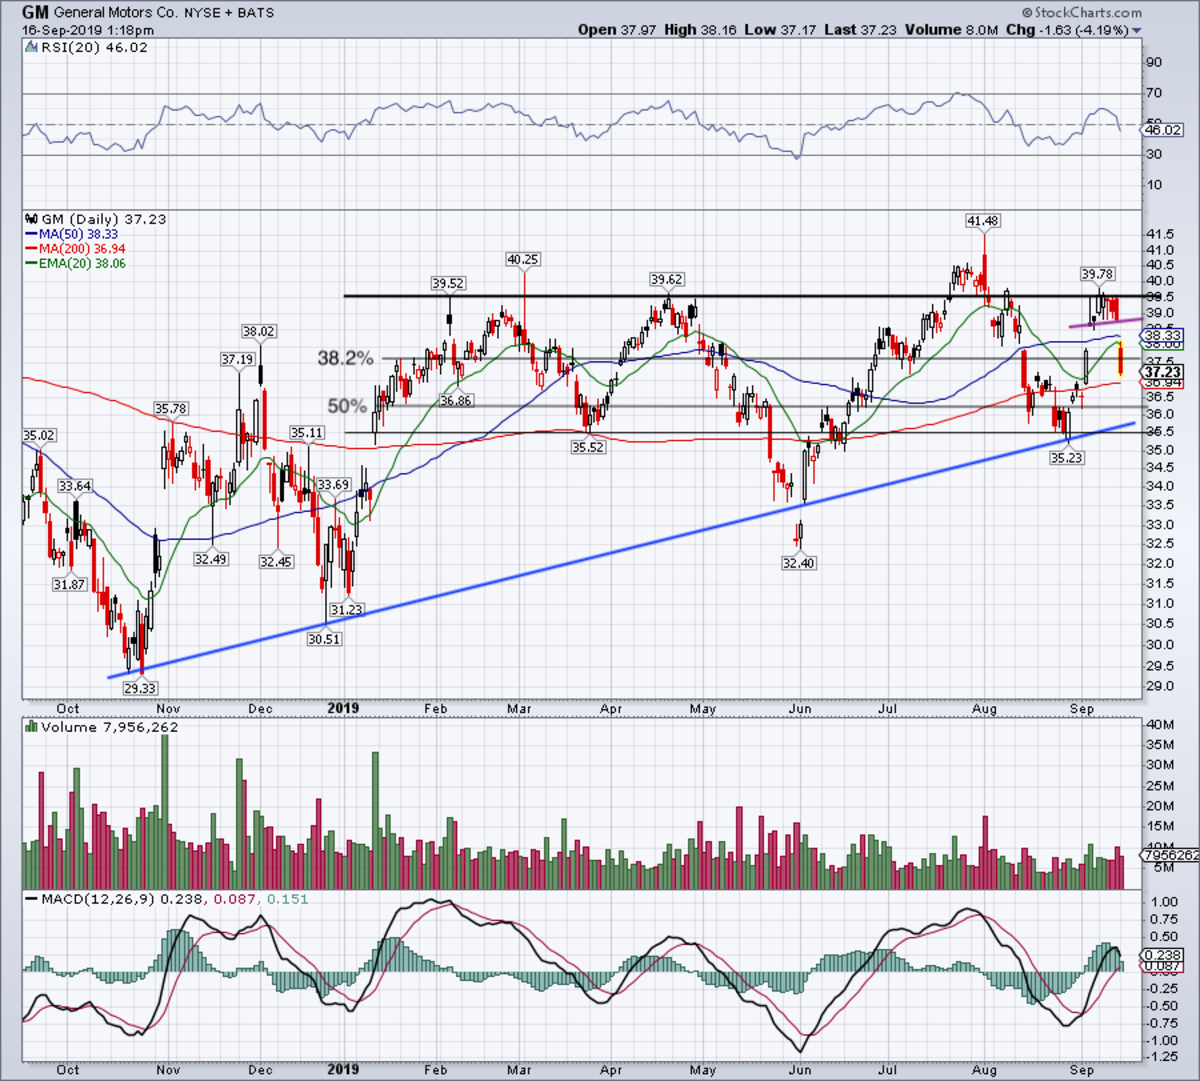 Daily chart of General Motors stock.